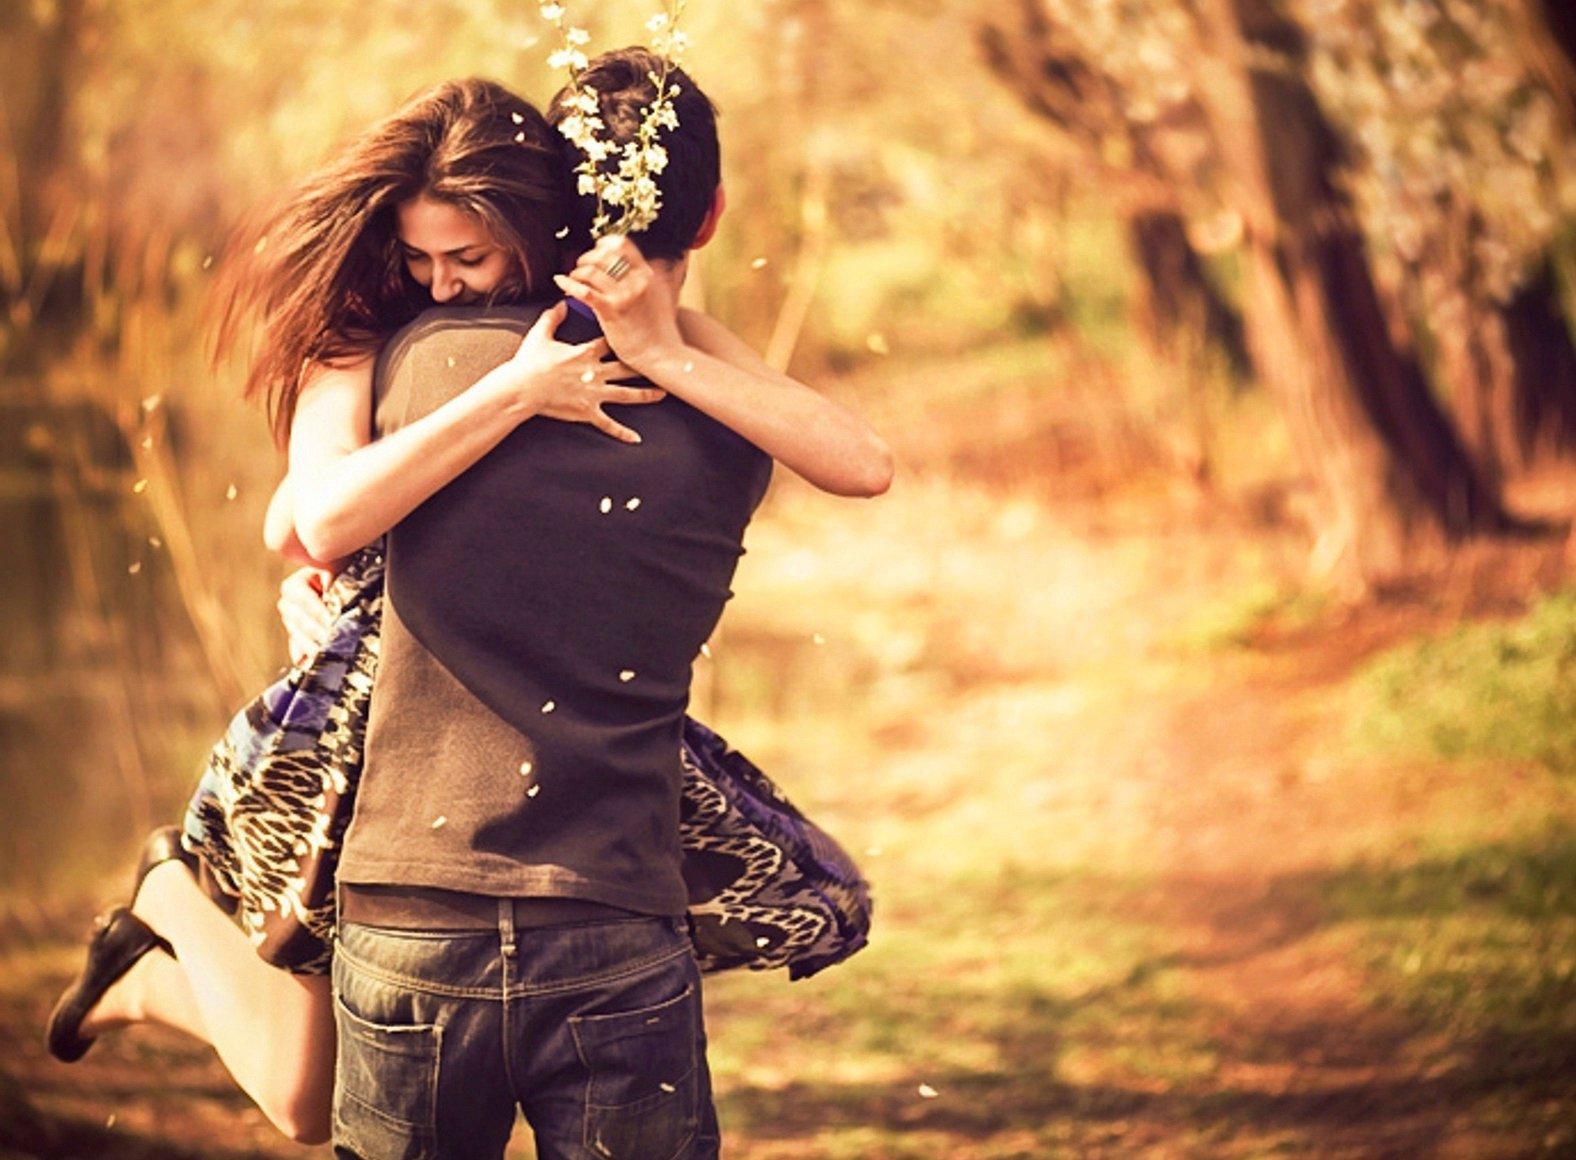 http://3.bp.blogspot.com/-2EBQ55dI_ko/UFWNjENth1I/AAAAAAAAAks/g506P12UDTg/s1600/Pleasing-Couple-Love-Hug-Wallpaper.jpg